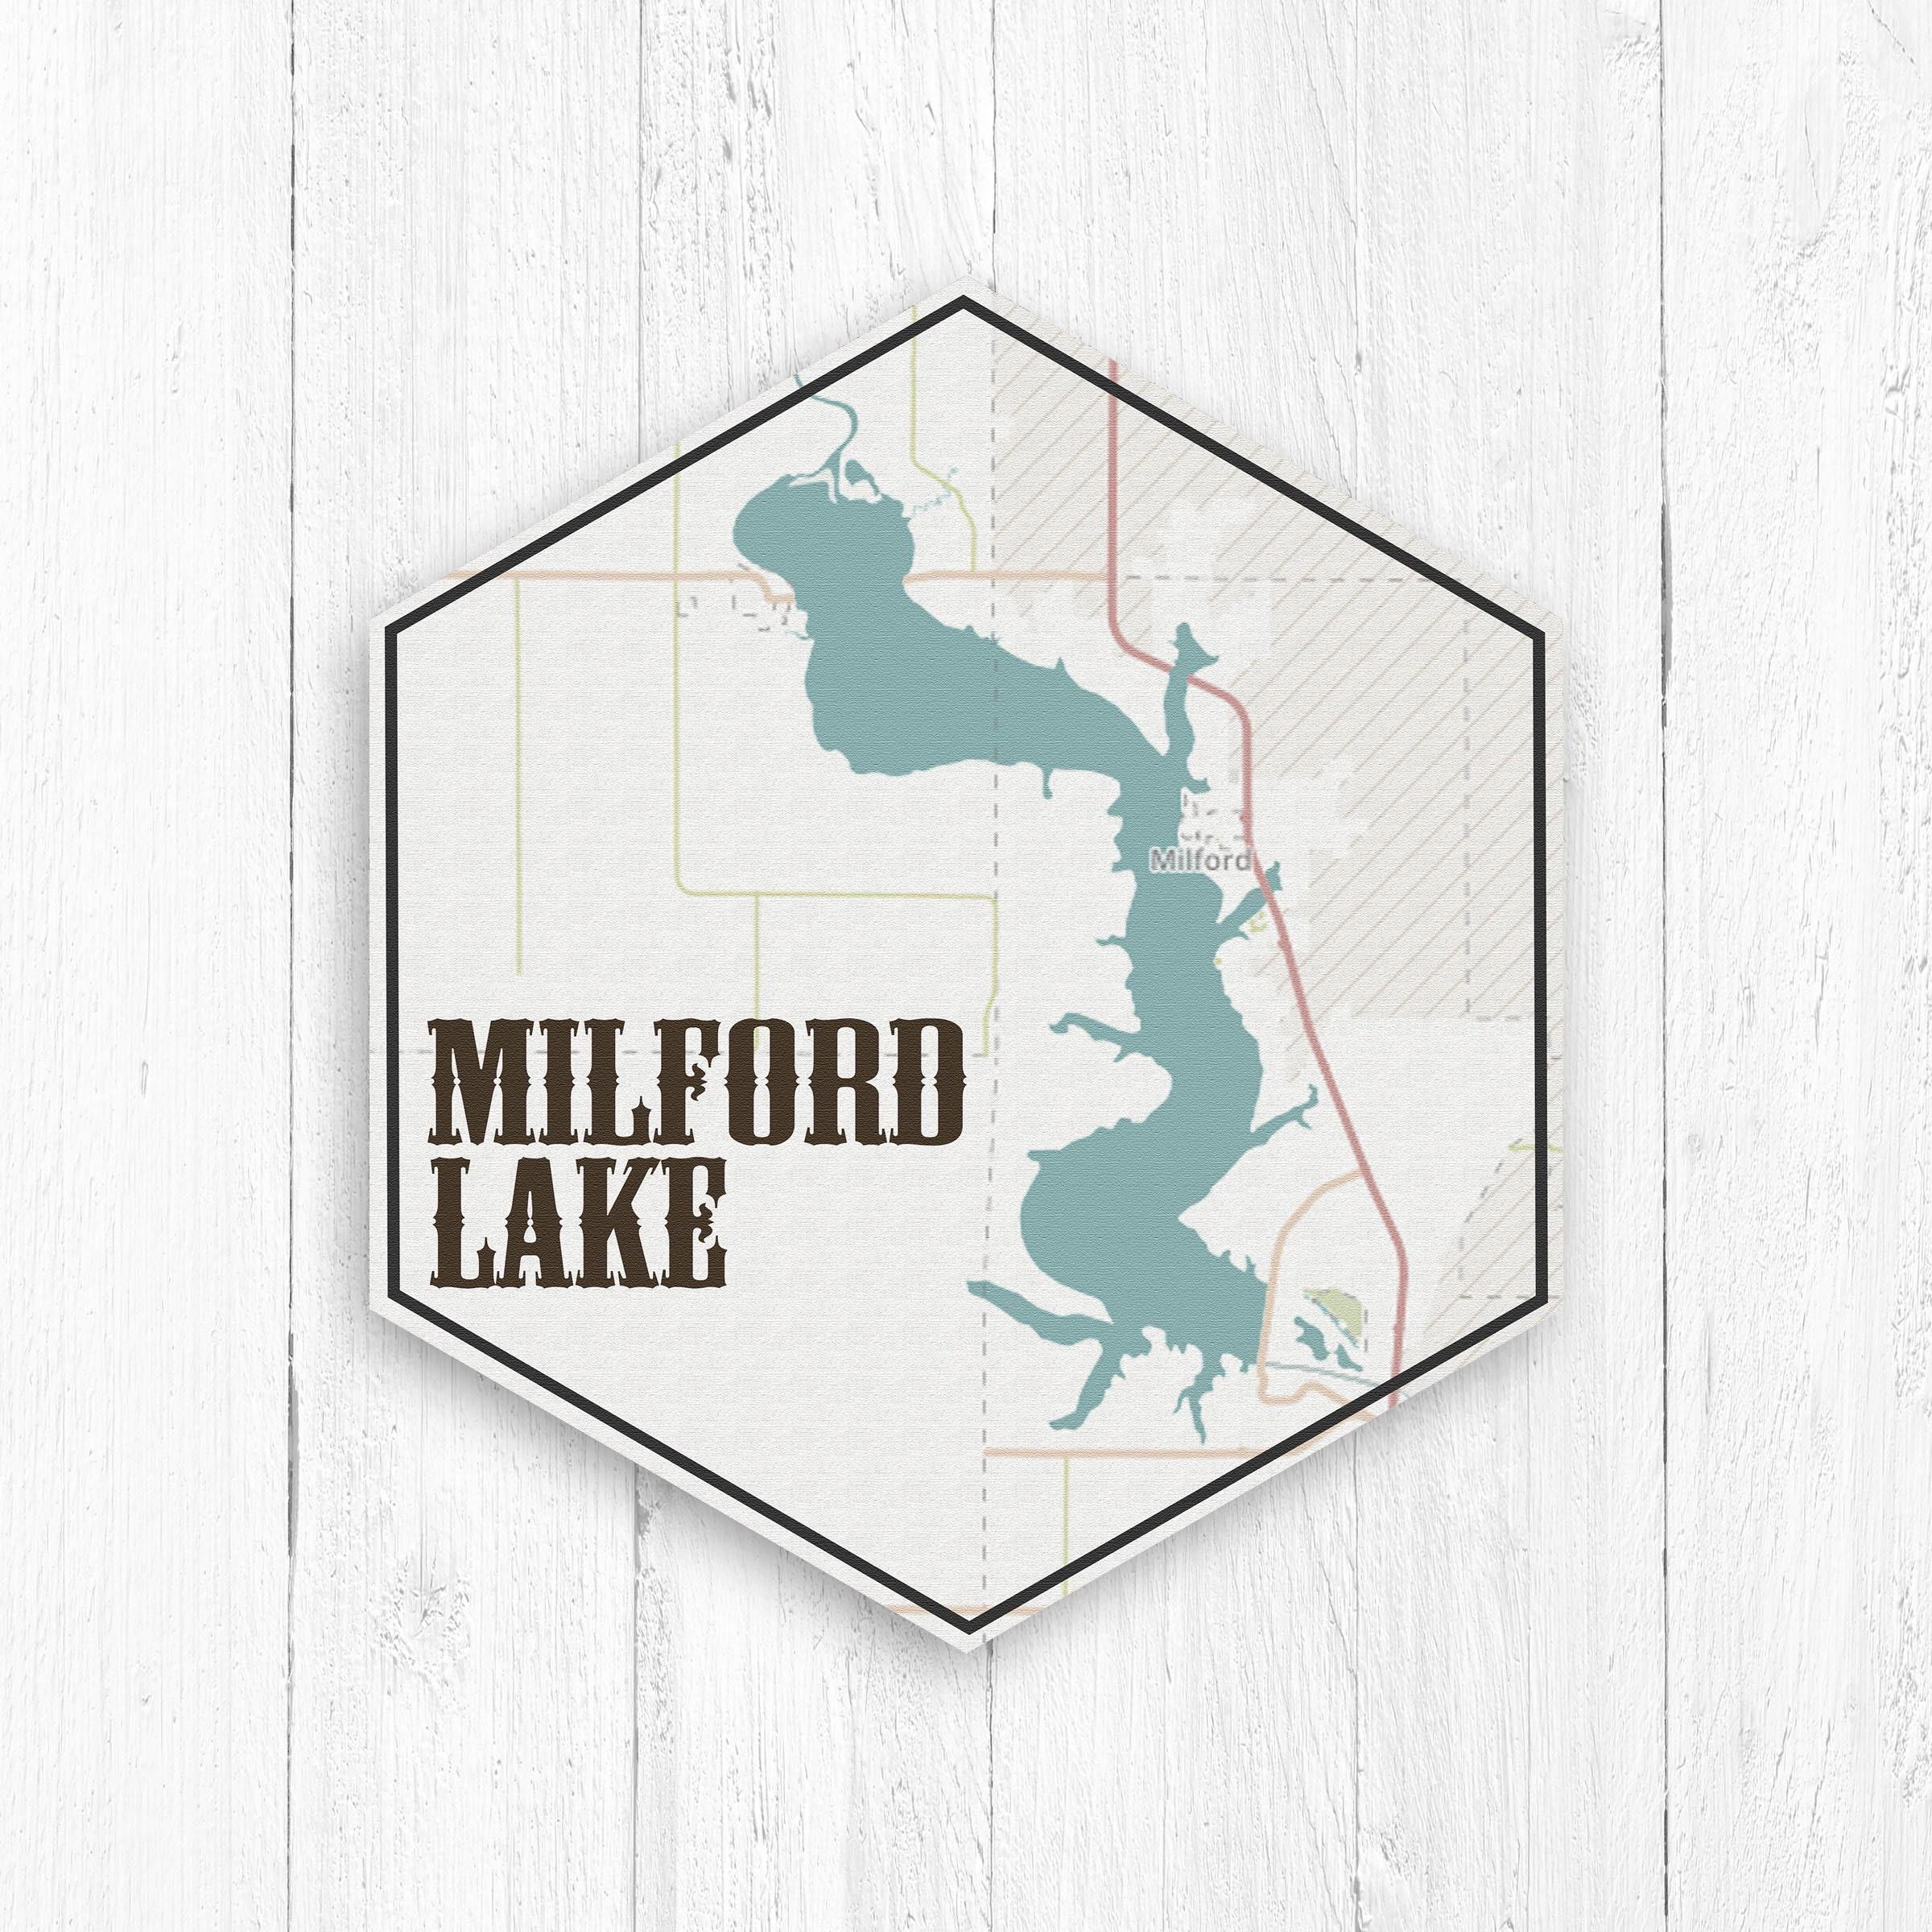 Milford Lake Kansas Map.Milford Lake Kansas Hexagon Canvas Milford Lake Canvas Lakes Of